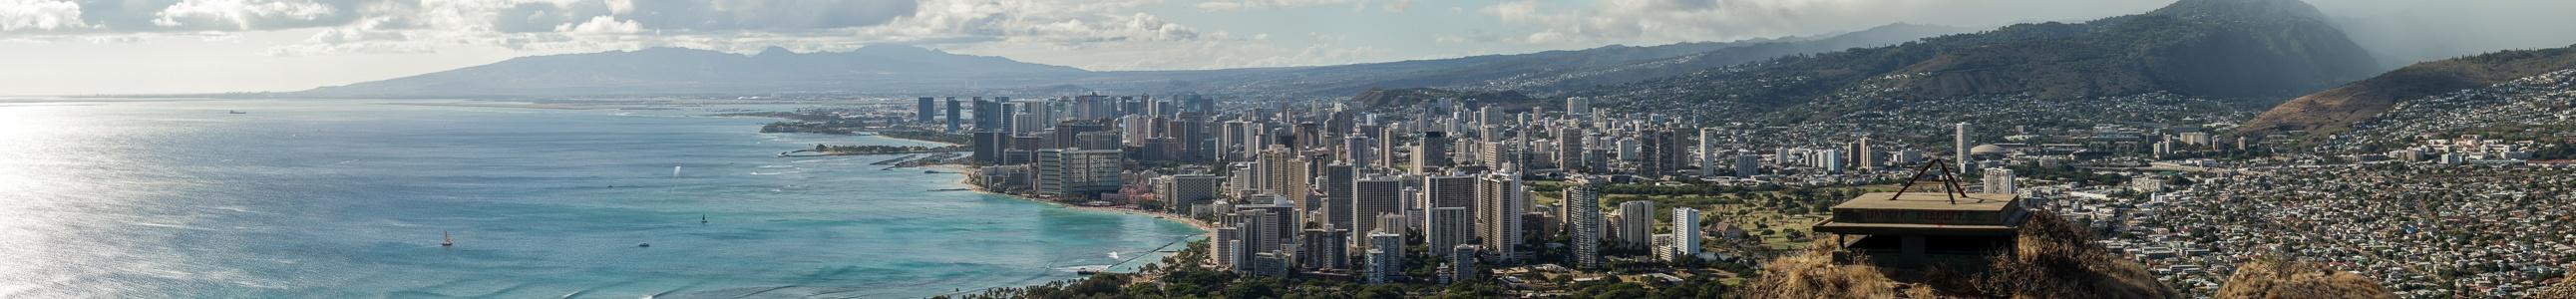 Blick vom Diamond Head: Pazifik und Honolulu Honolulu